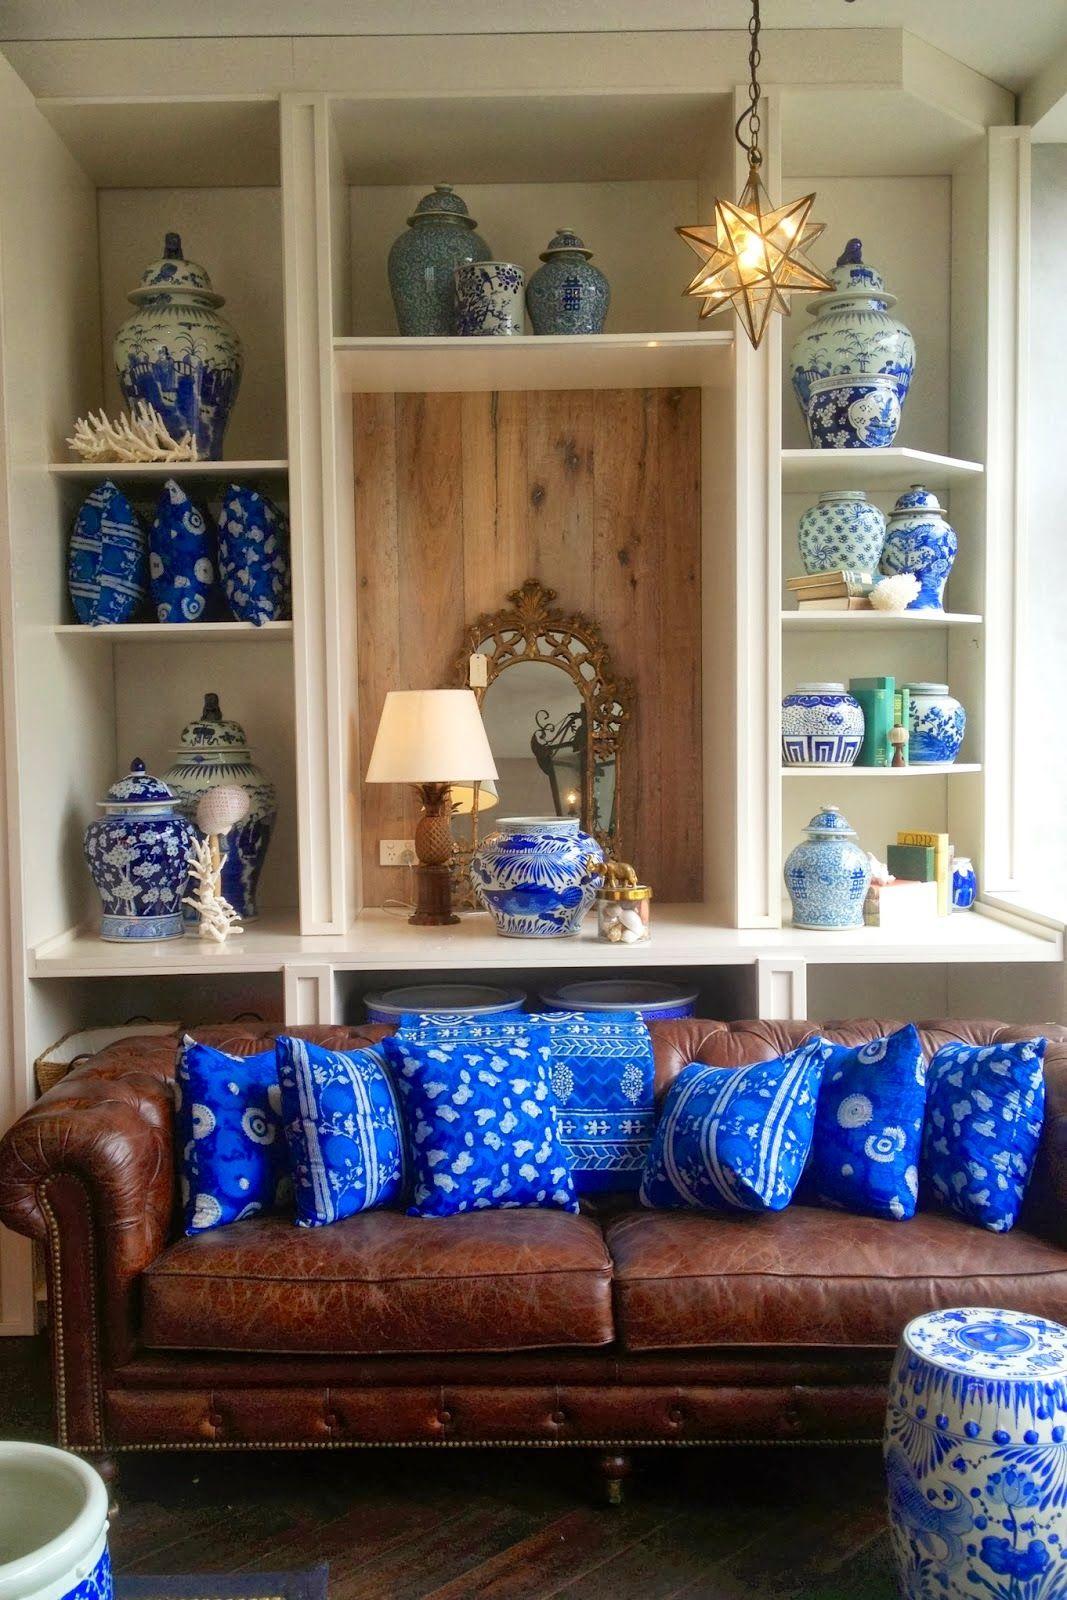 Best Portobello Home Blue And White China Vintage Brown 400 x 300